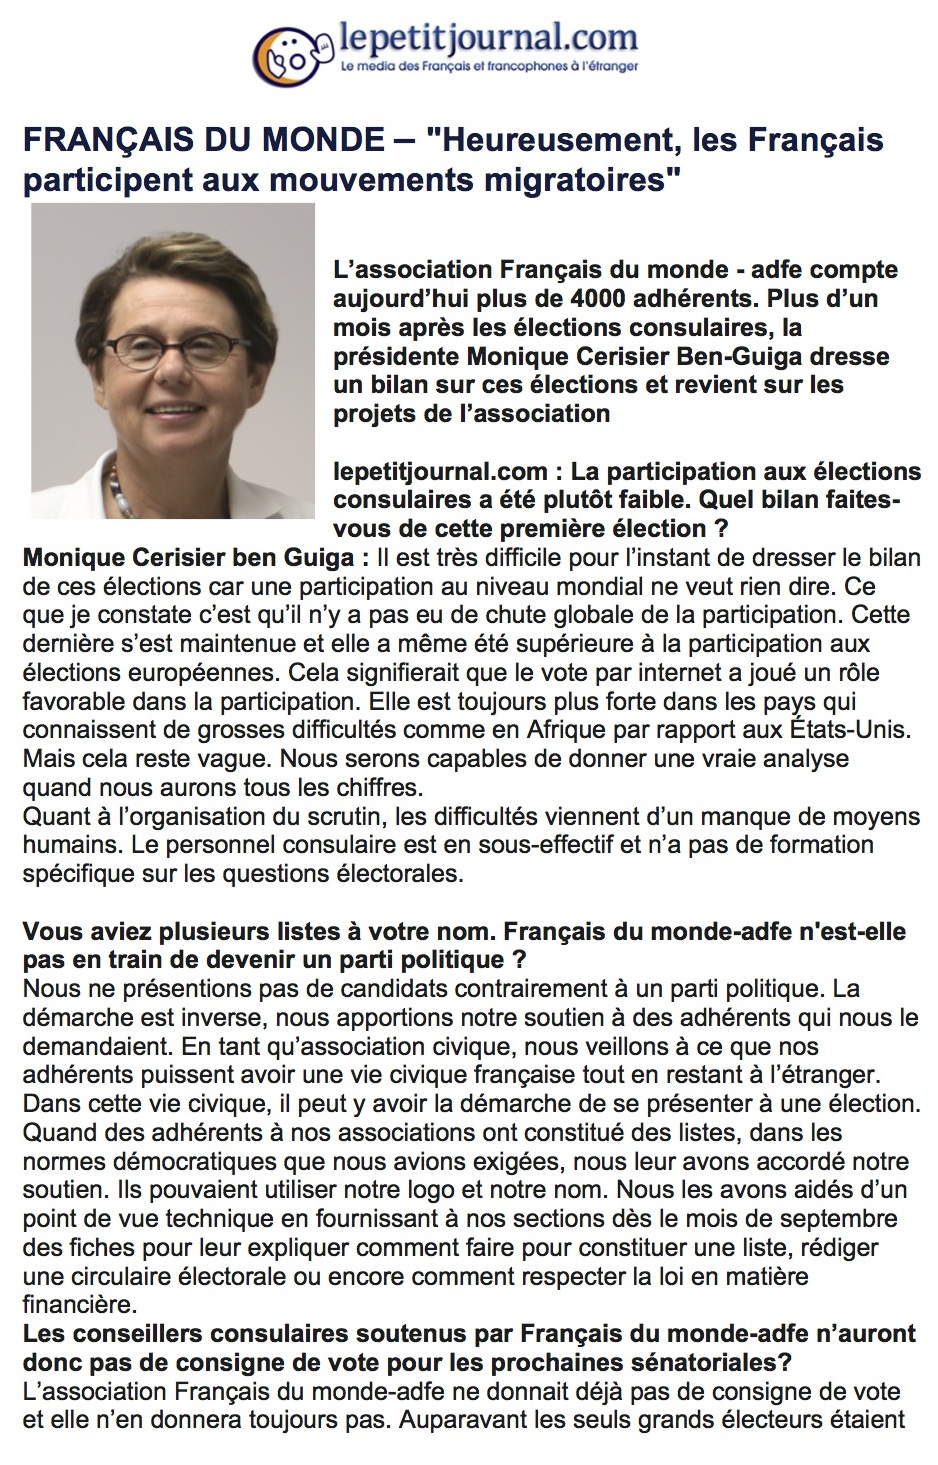 Le Petit J_MCBG